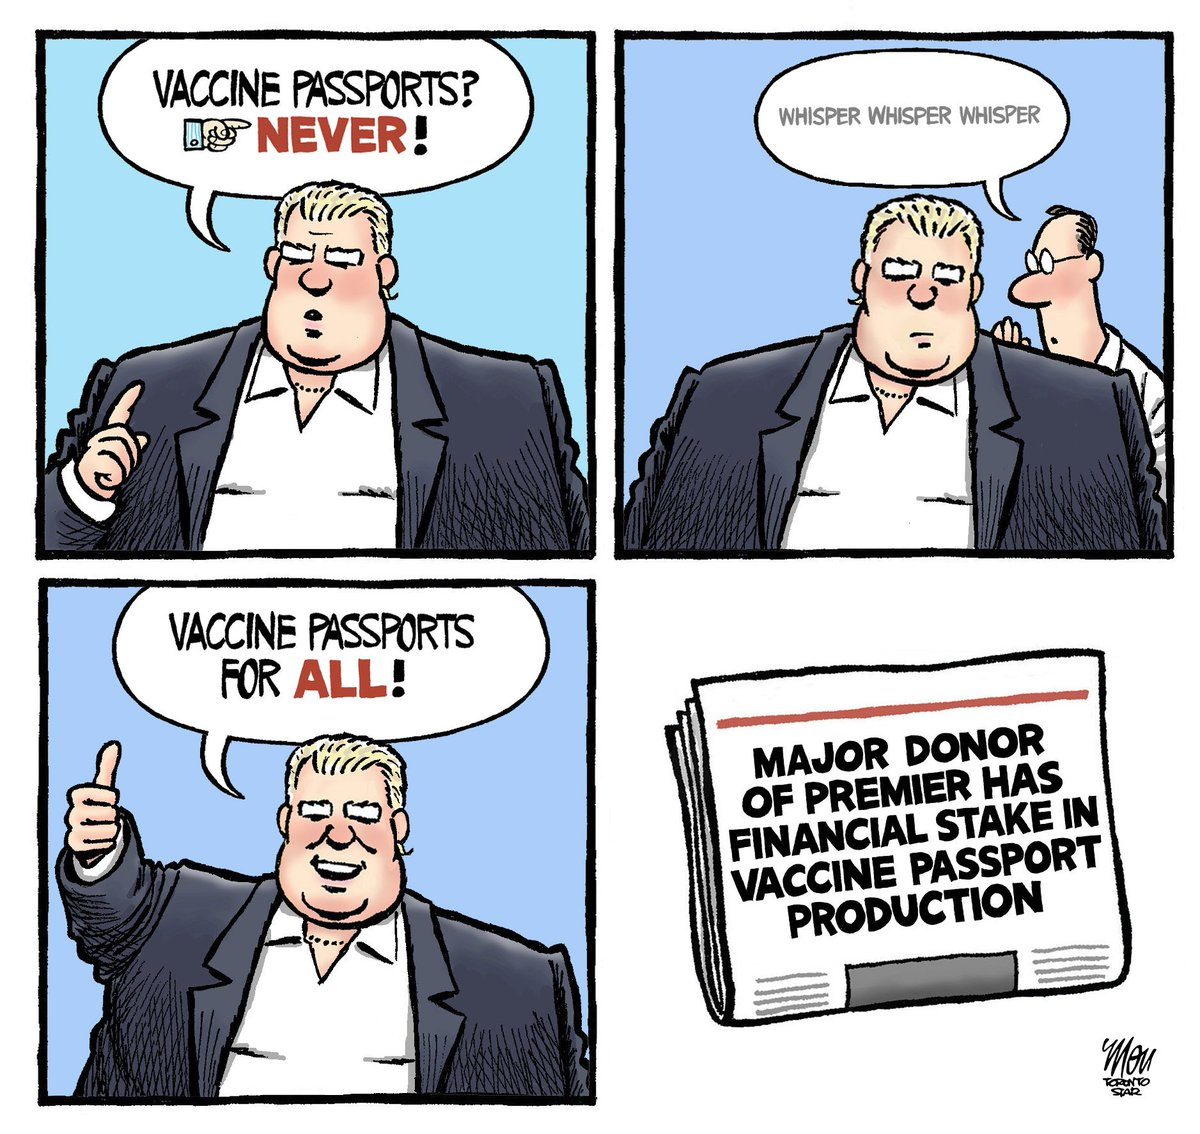 Please enjoy my #VaccinePassports cartoon in today's @TorontoStar #onpoli https://t.co/T4eCQBxtJD